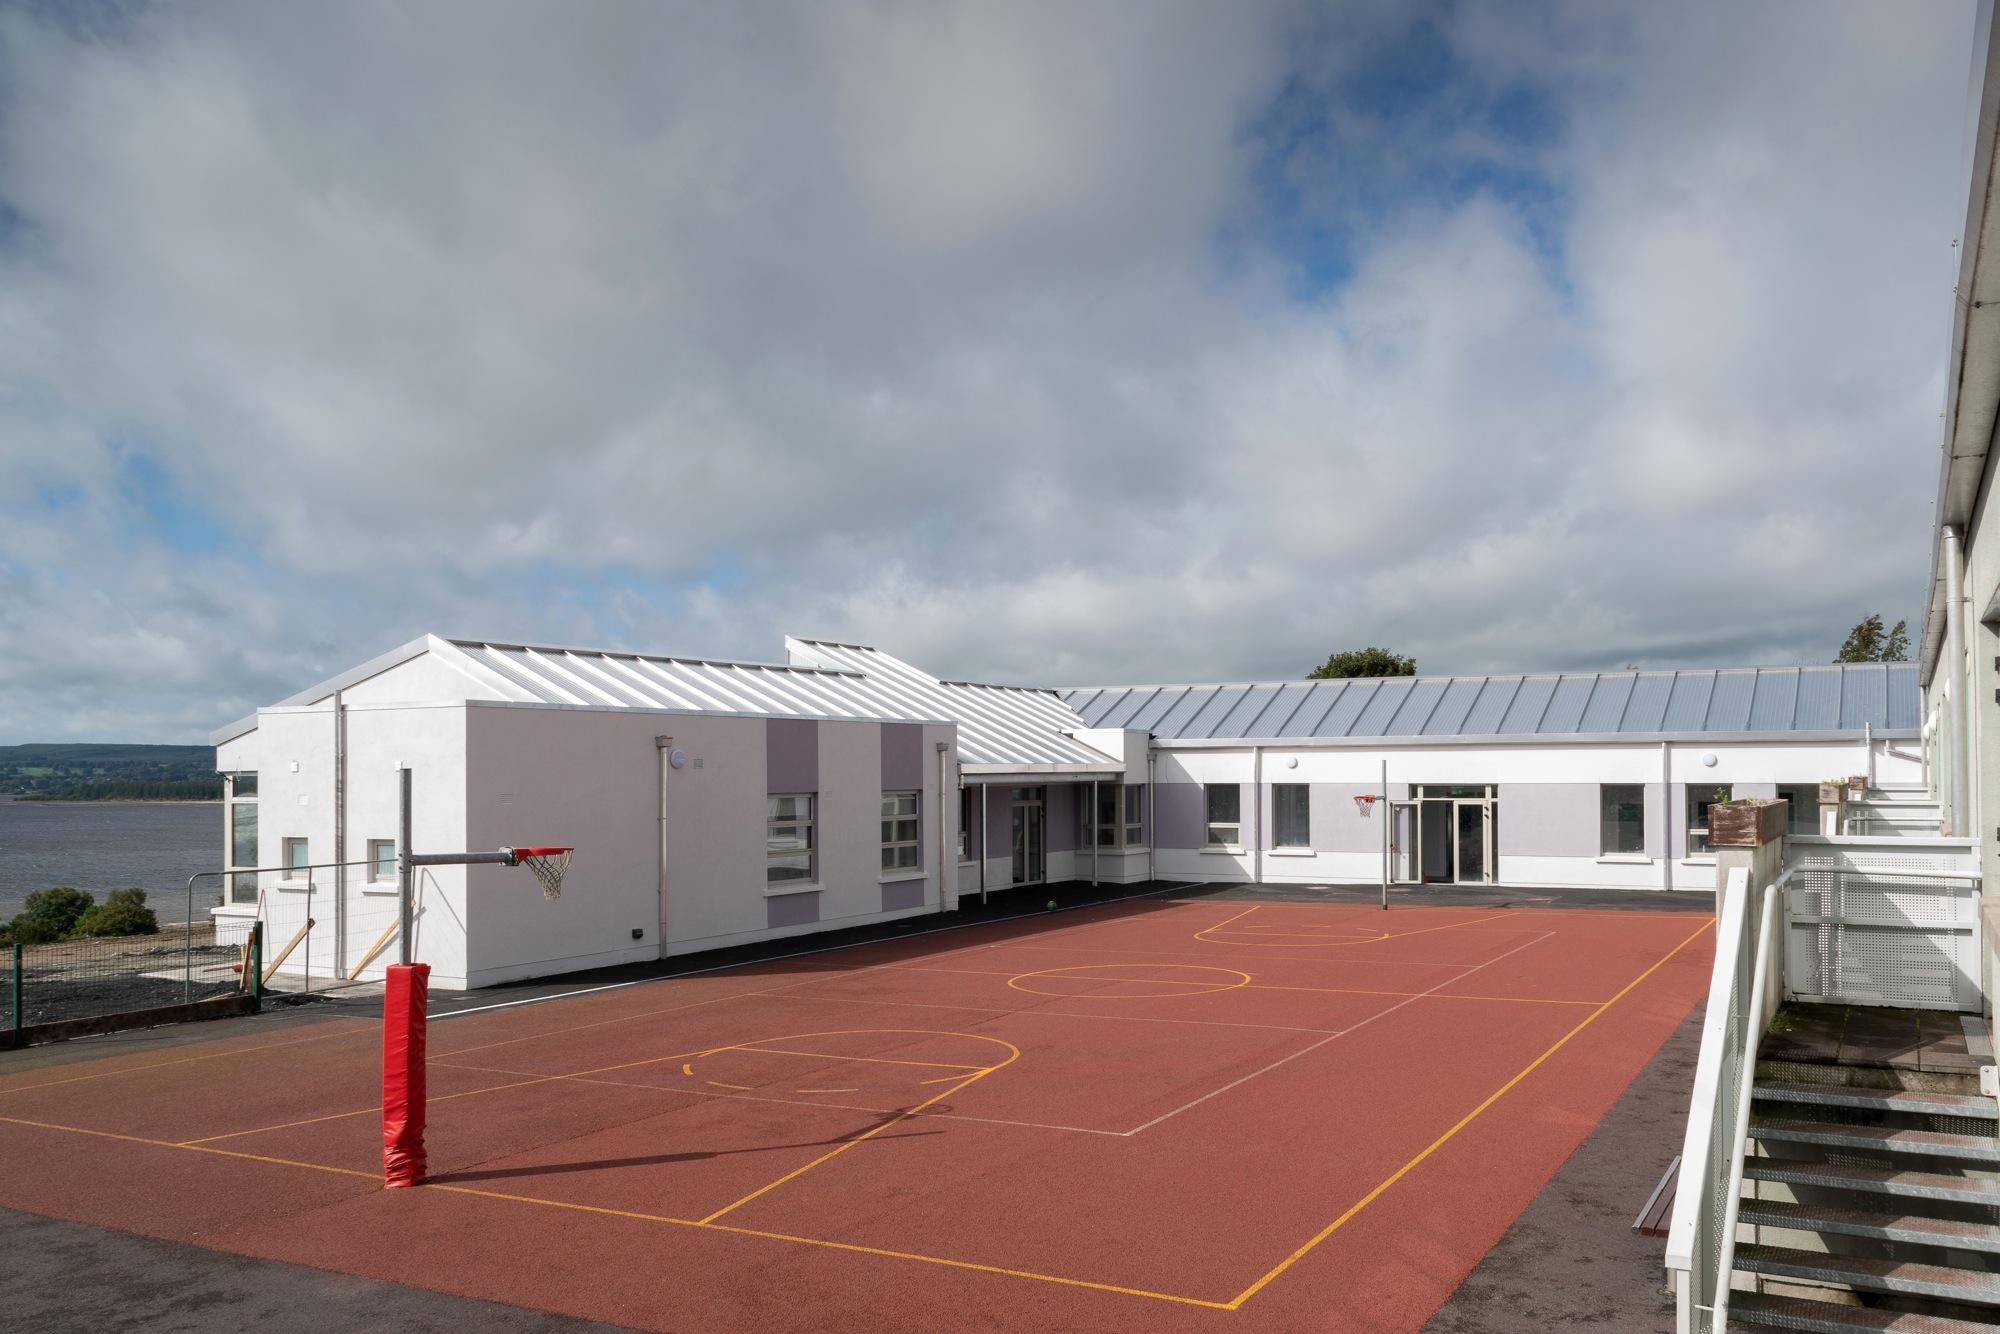 Lacken National School, Blessington